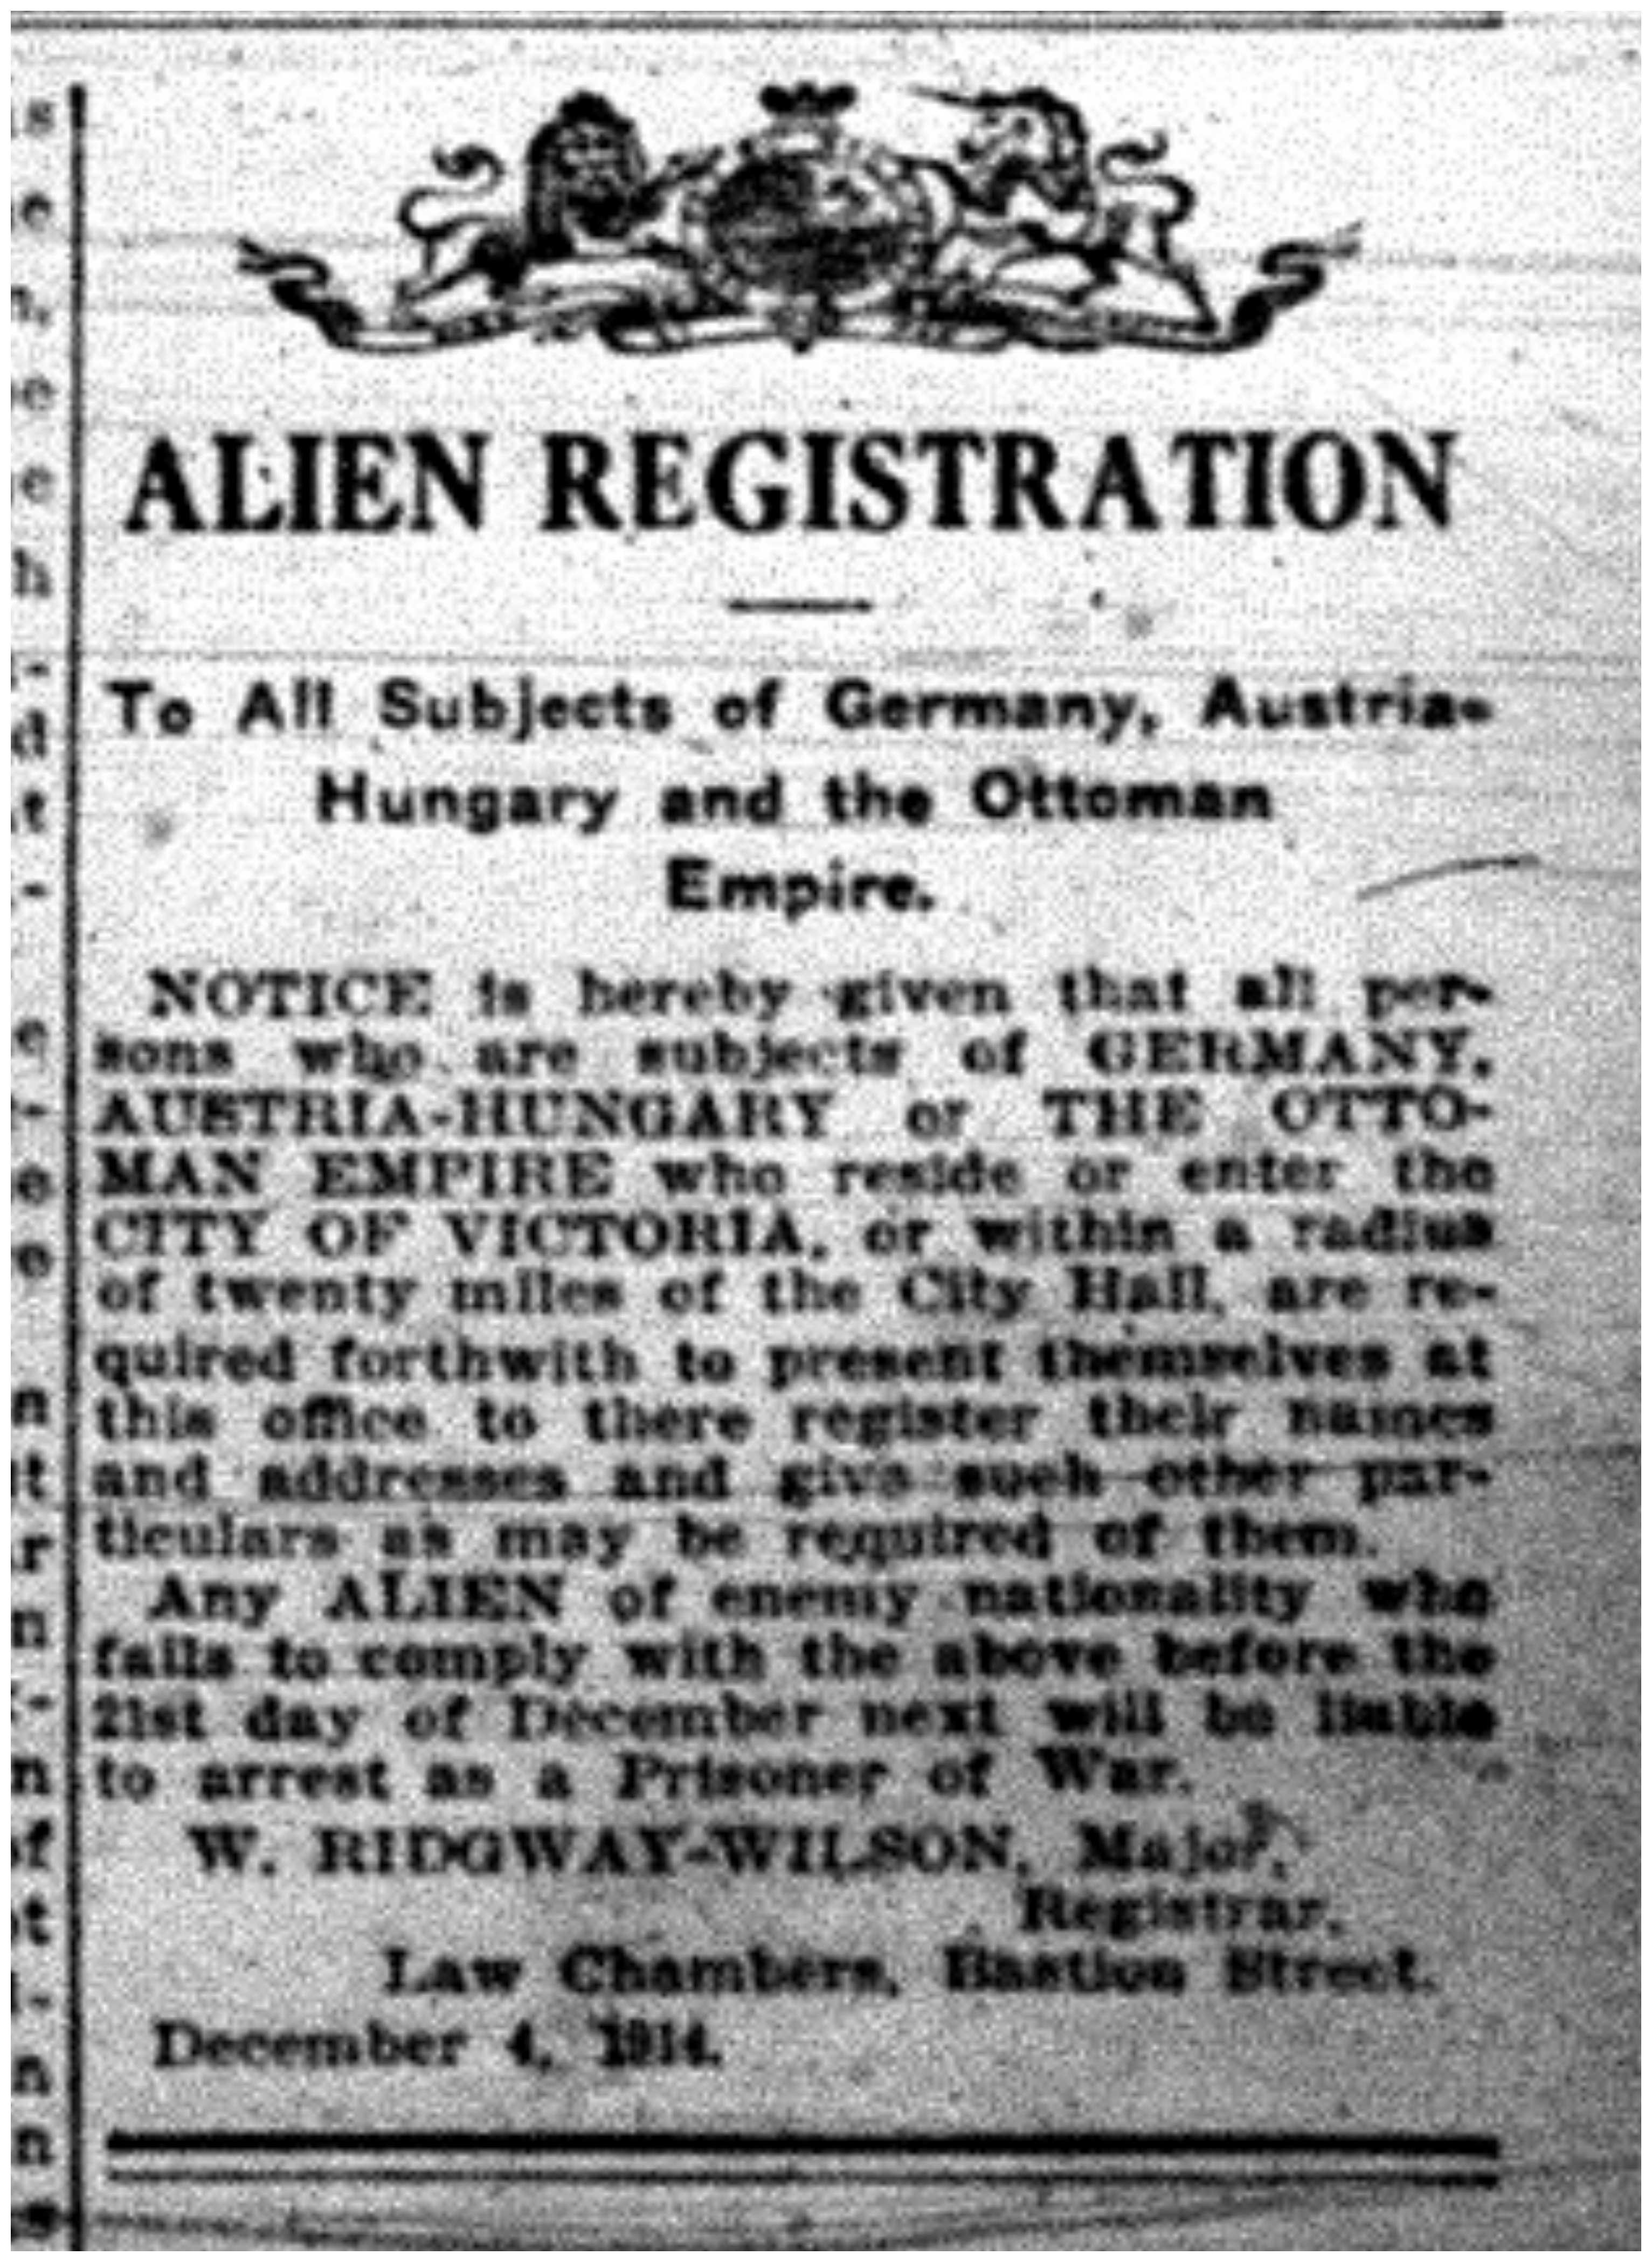 """Alien Registration"""